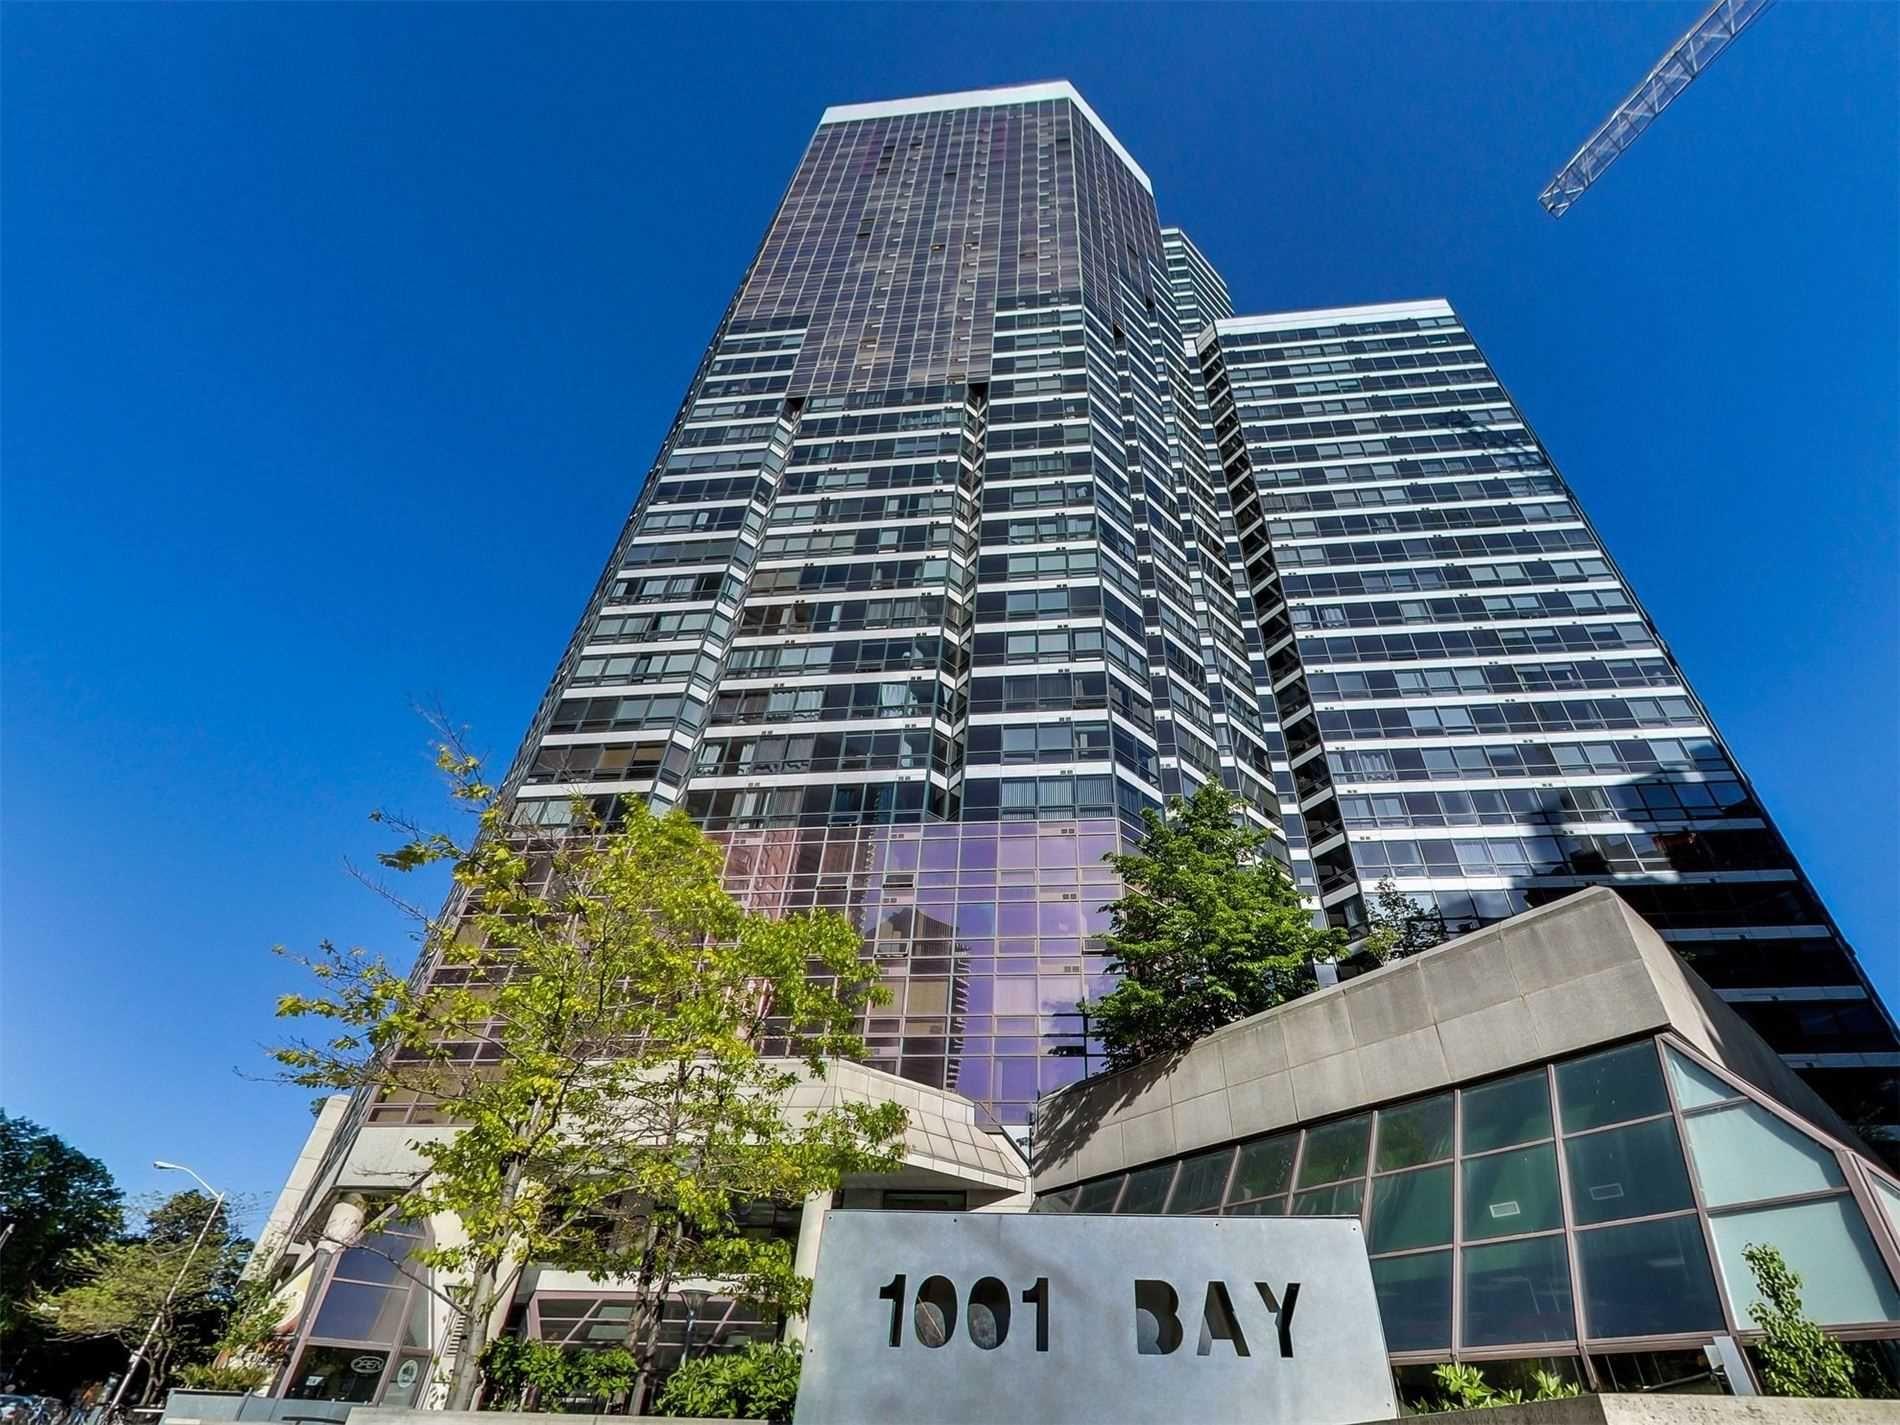 Main Photo: 813 1001 Bay Street in Toronto: Bay Street Corridor Condo for sale (Toronto C01)  : MLS®# C4706689